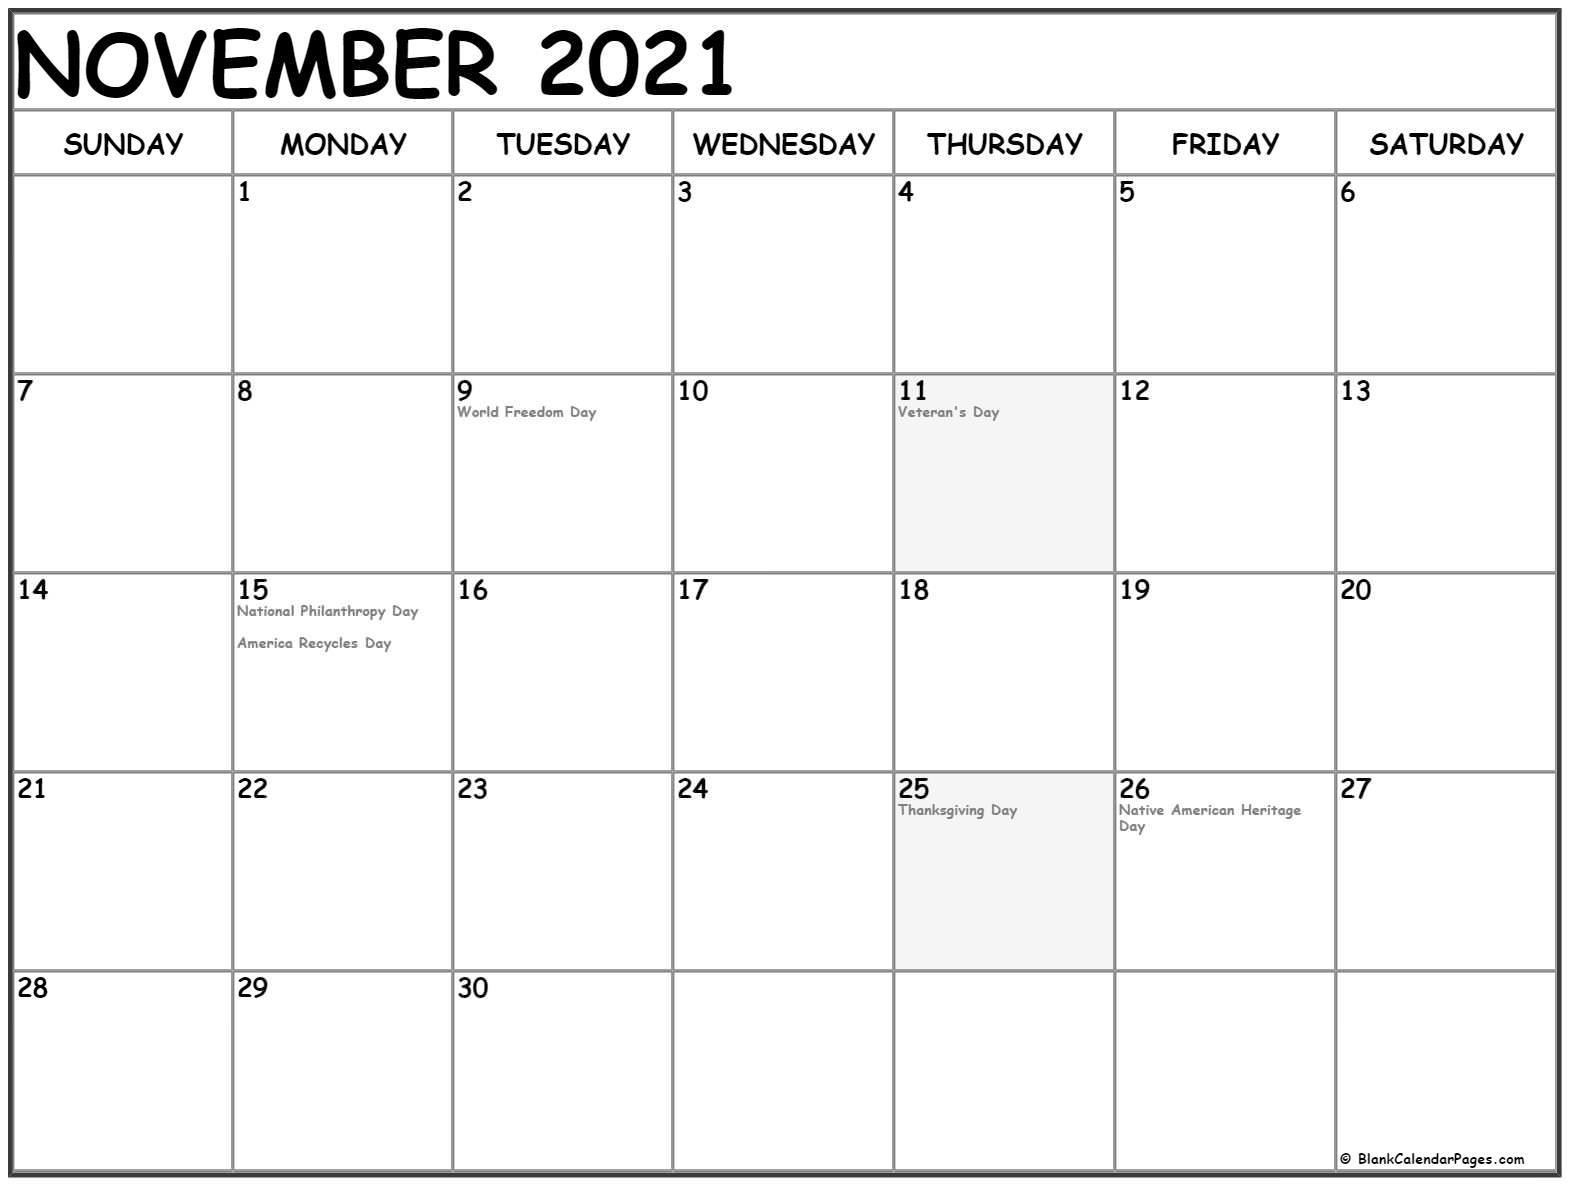 November 2021 Calendar With Holidays-Festive Printable Calendar 2021